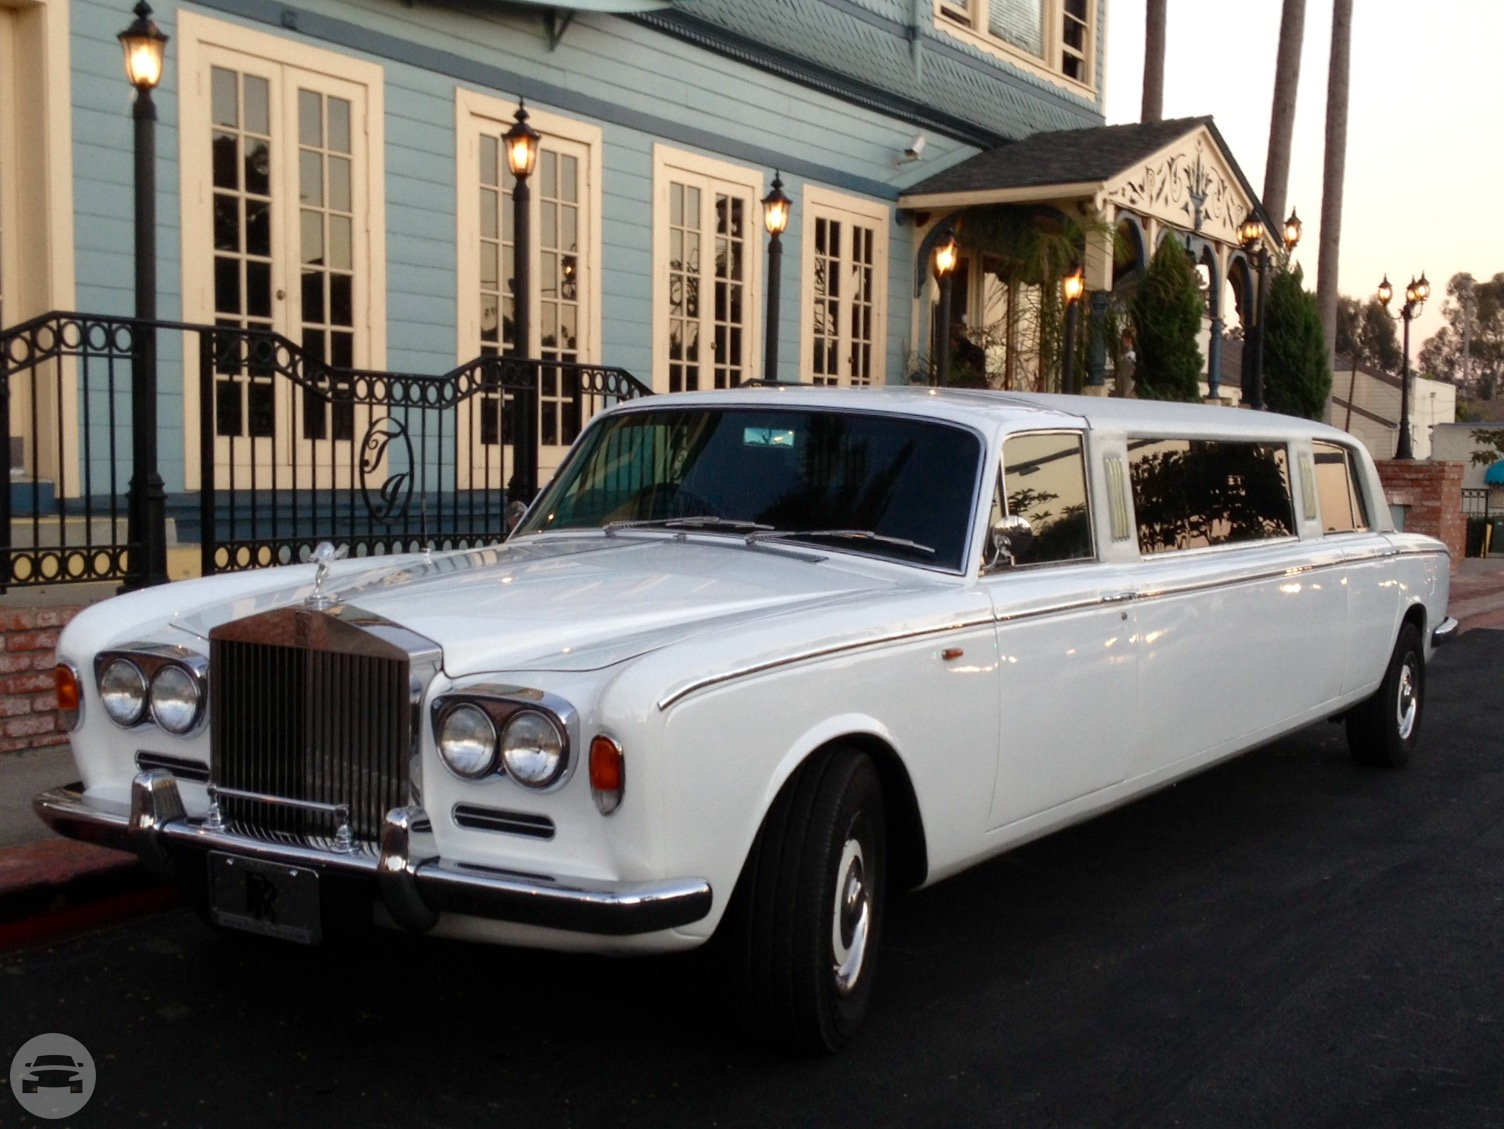 Rolls Royce Limo >> 1967 Rolls Royce Silver Shadow 8 Passenger Limousine Rolls